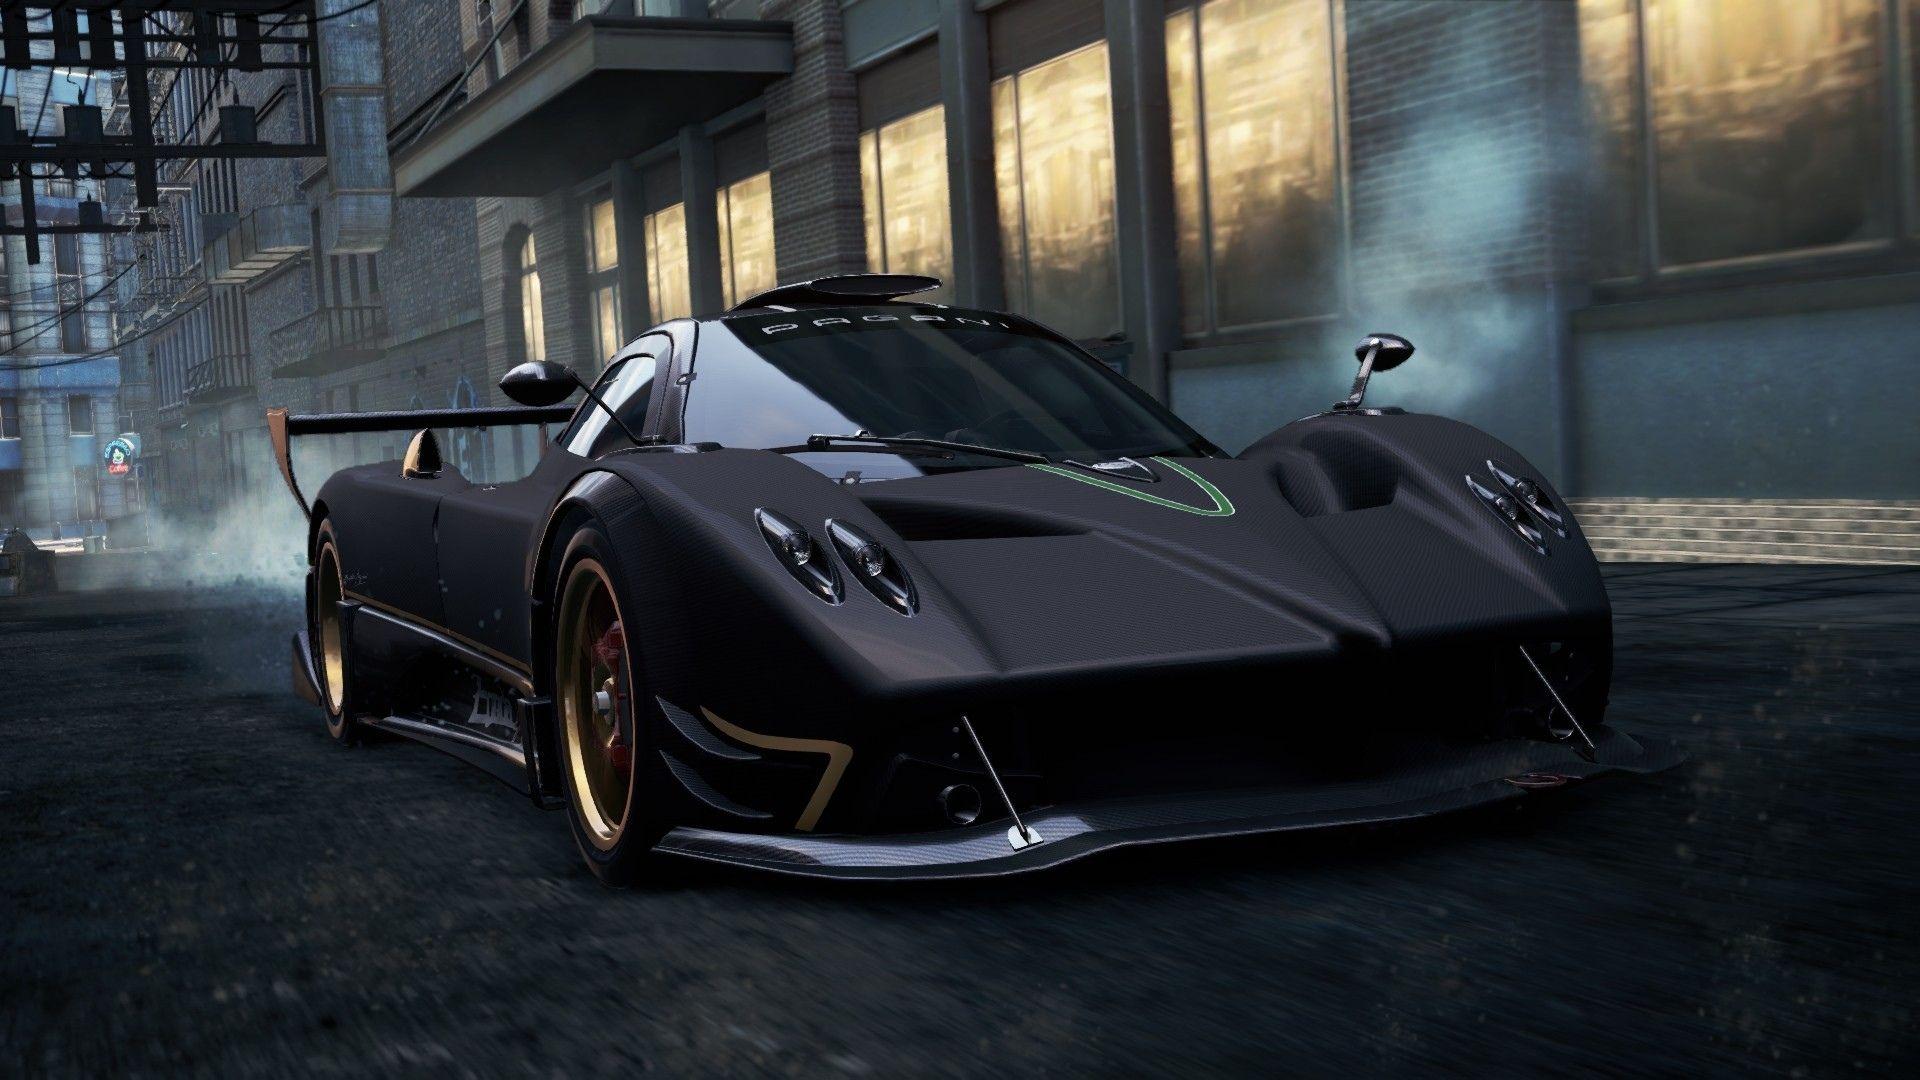 352edf813a06e5033911b6cea2b8bdee Mesmerizing Bugatti Veyron Nfs Most Wanted Cars Trend